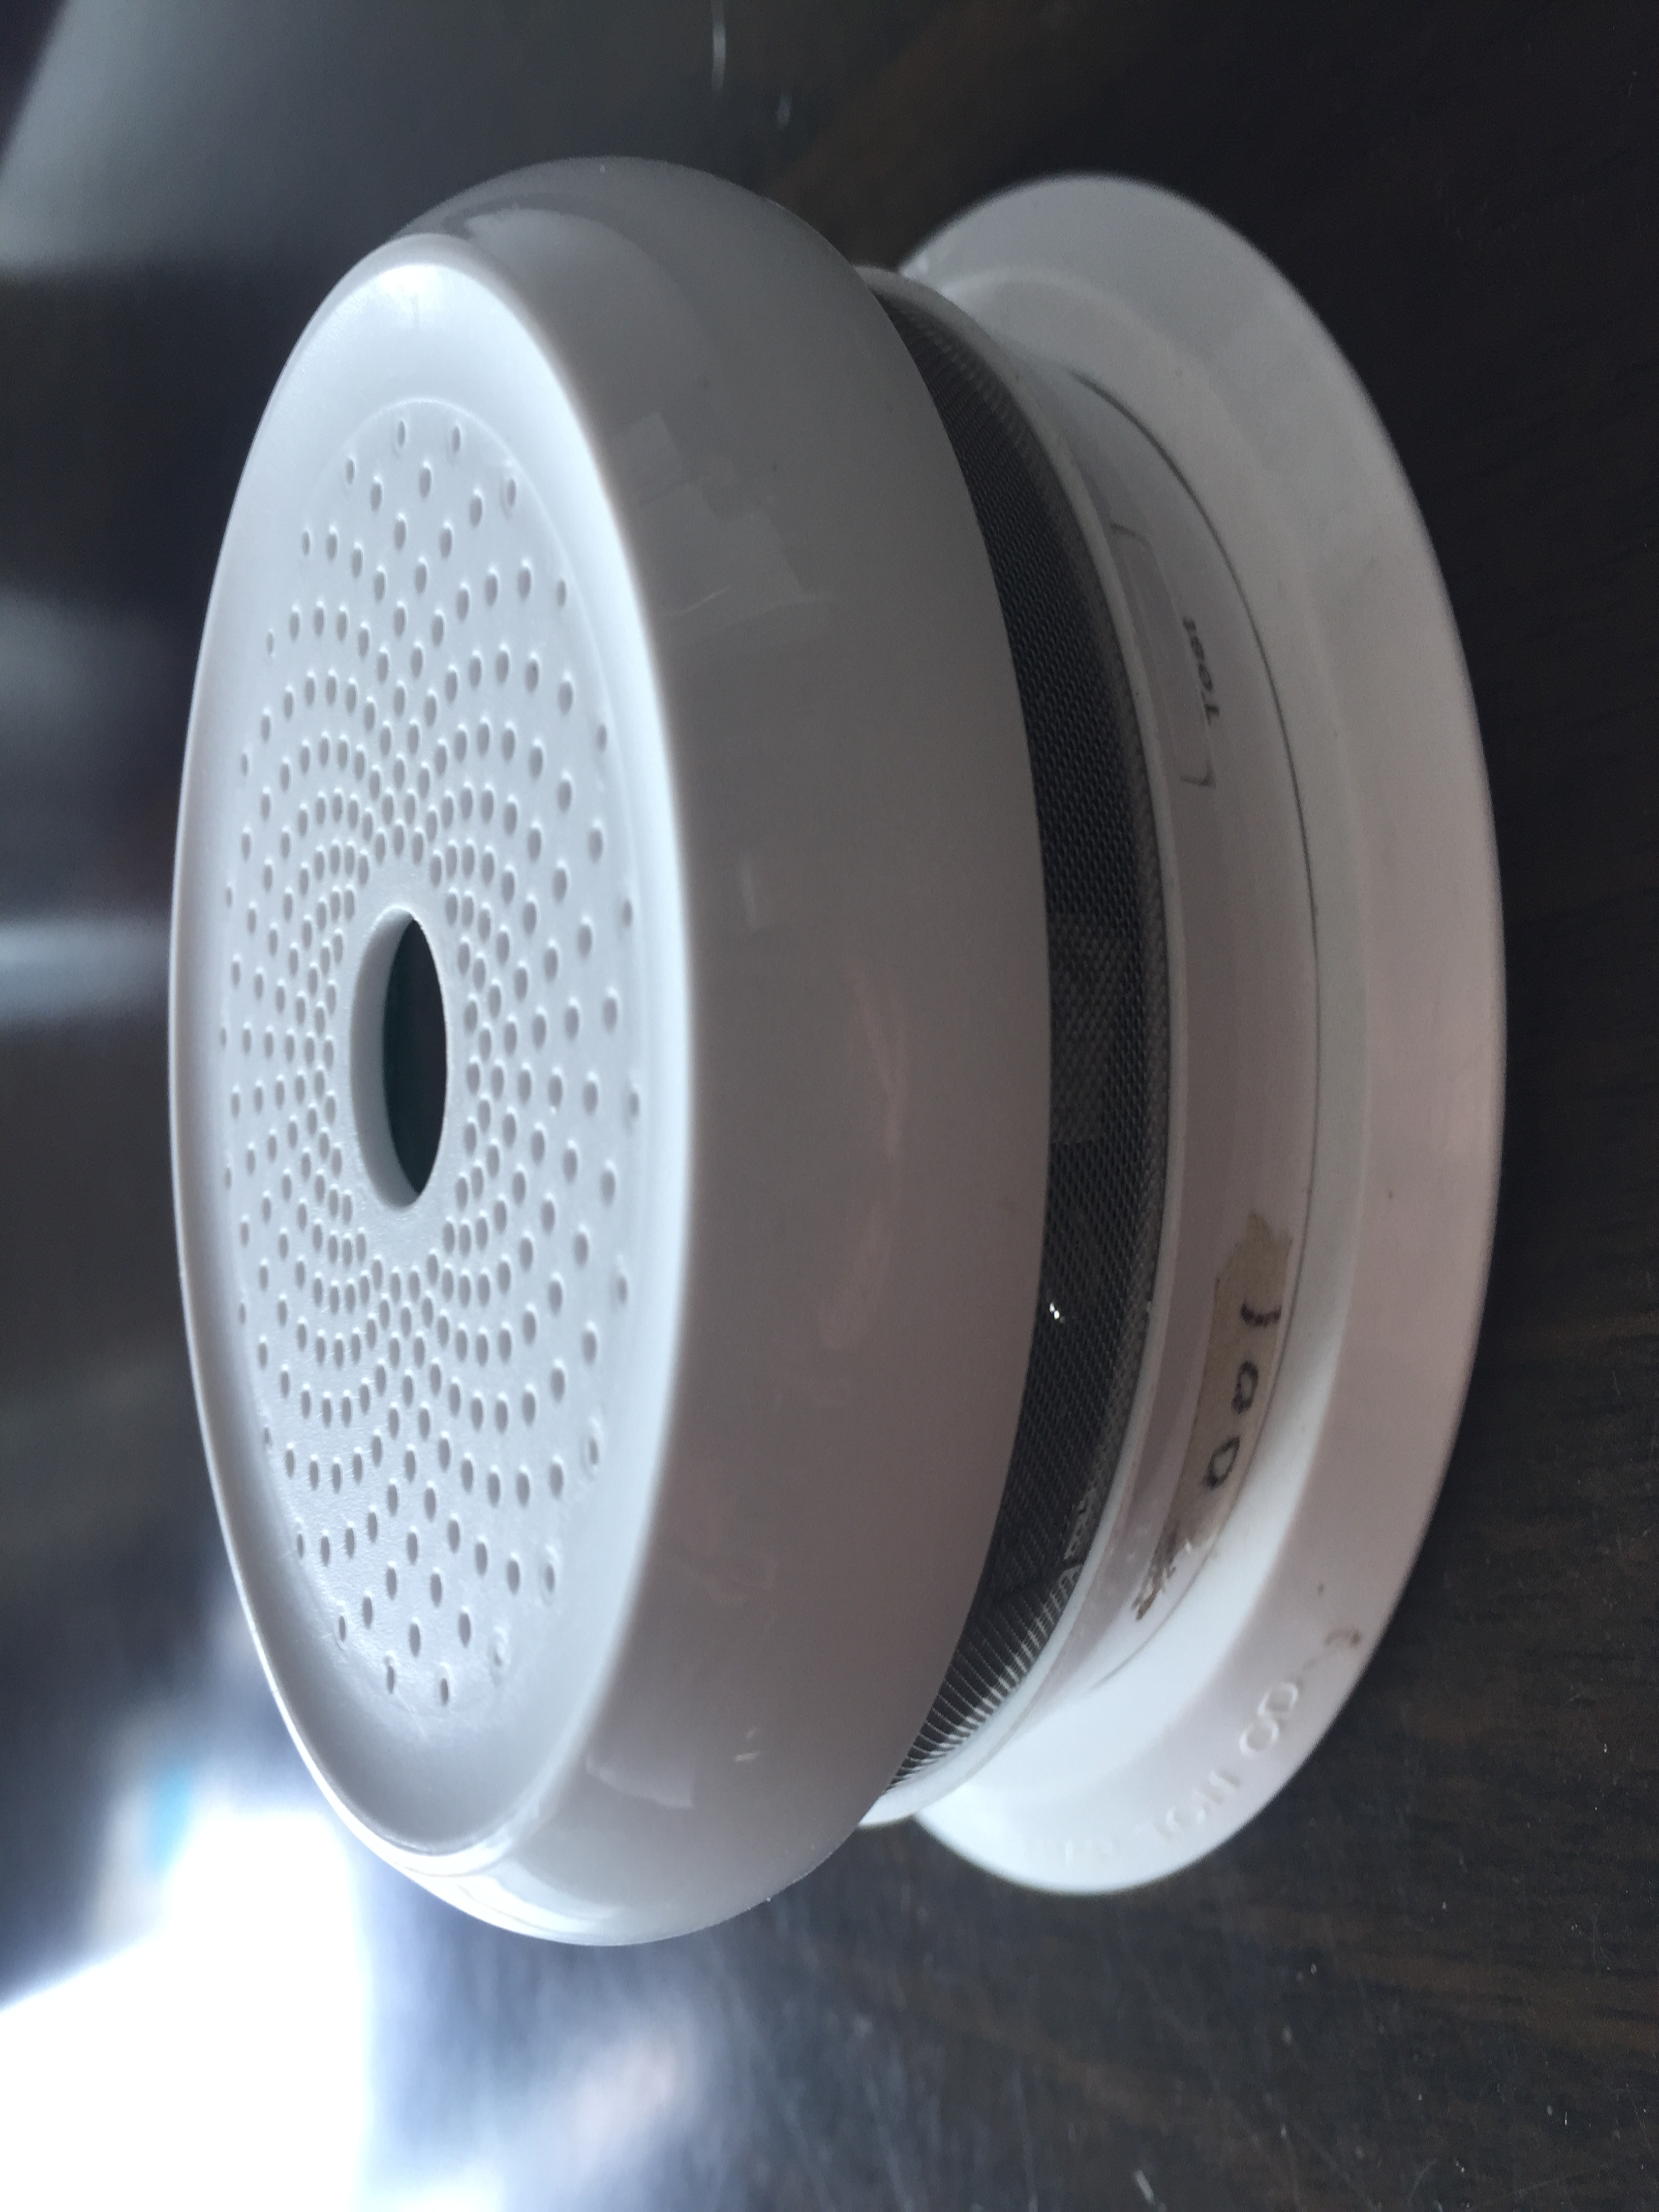 ZigBee WIfi Smart Temperature Smoke  And Humidity Detector App Alarming Sensor